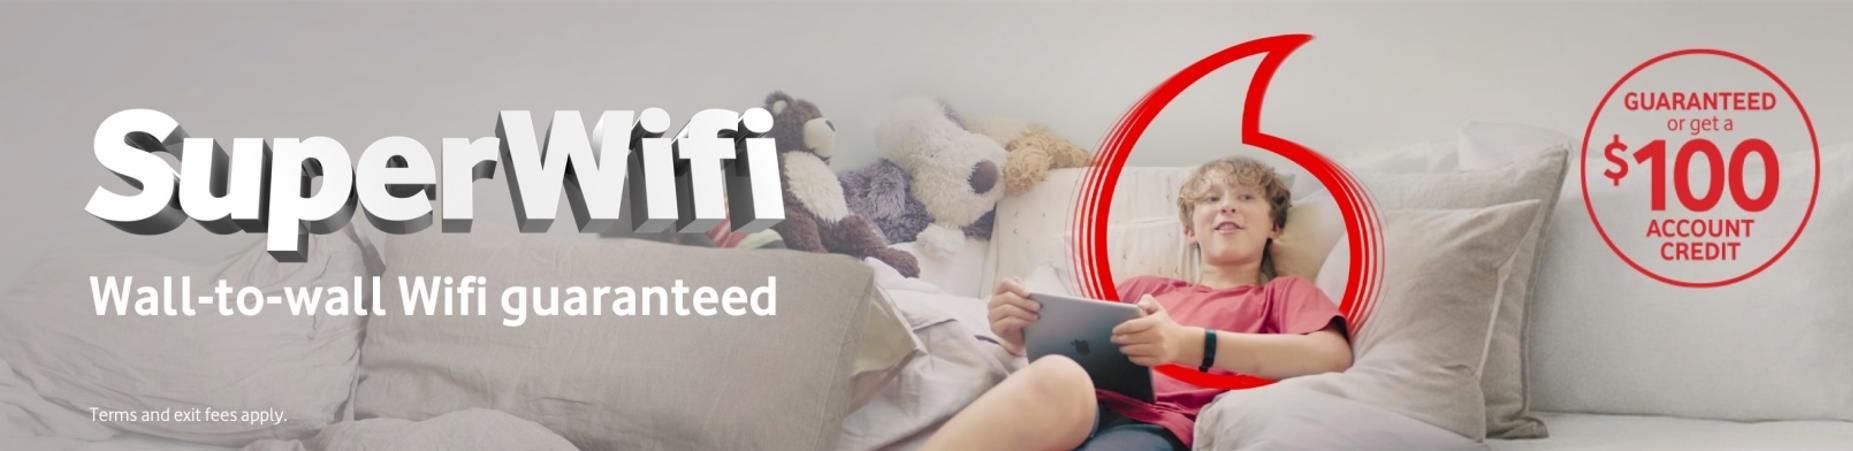 Vodafone SuperWifi Offer